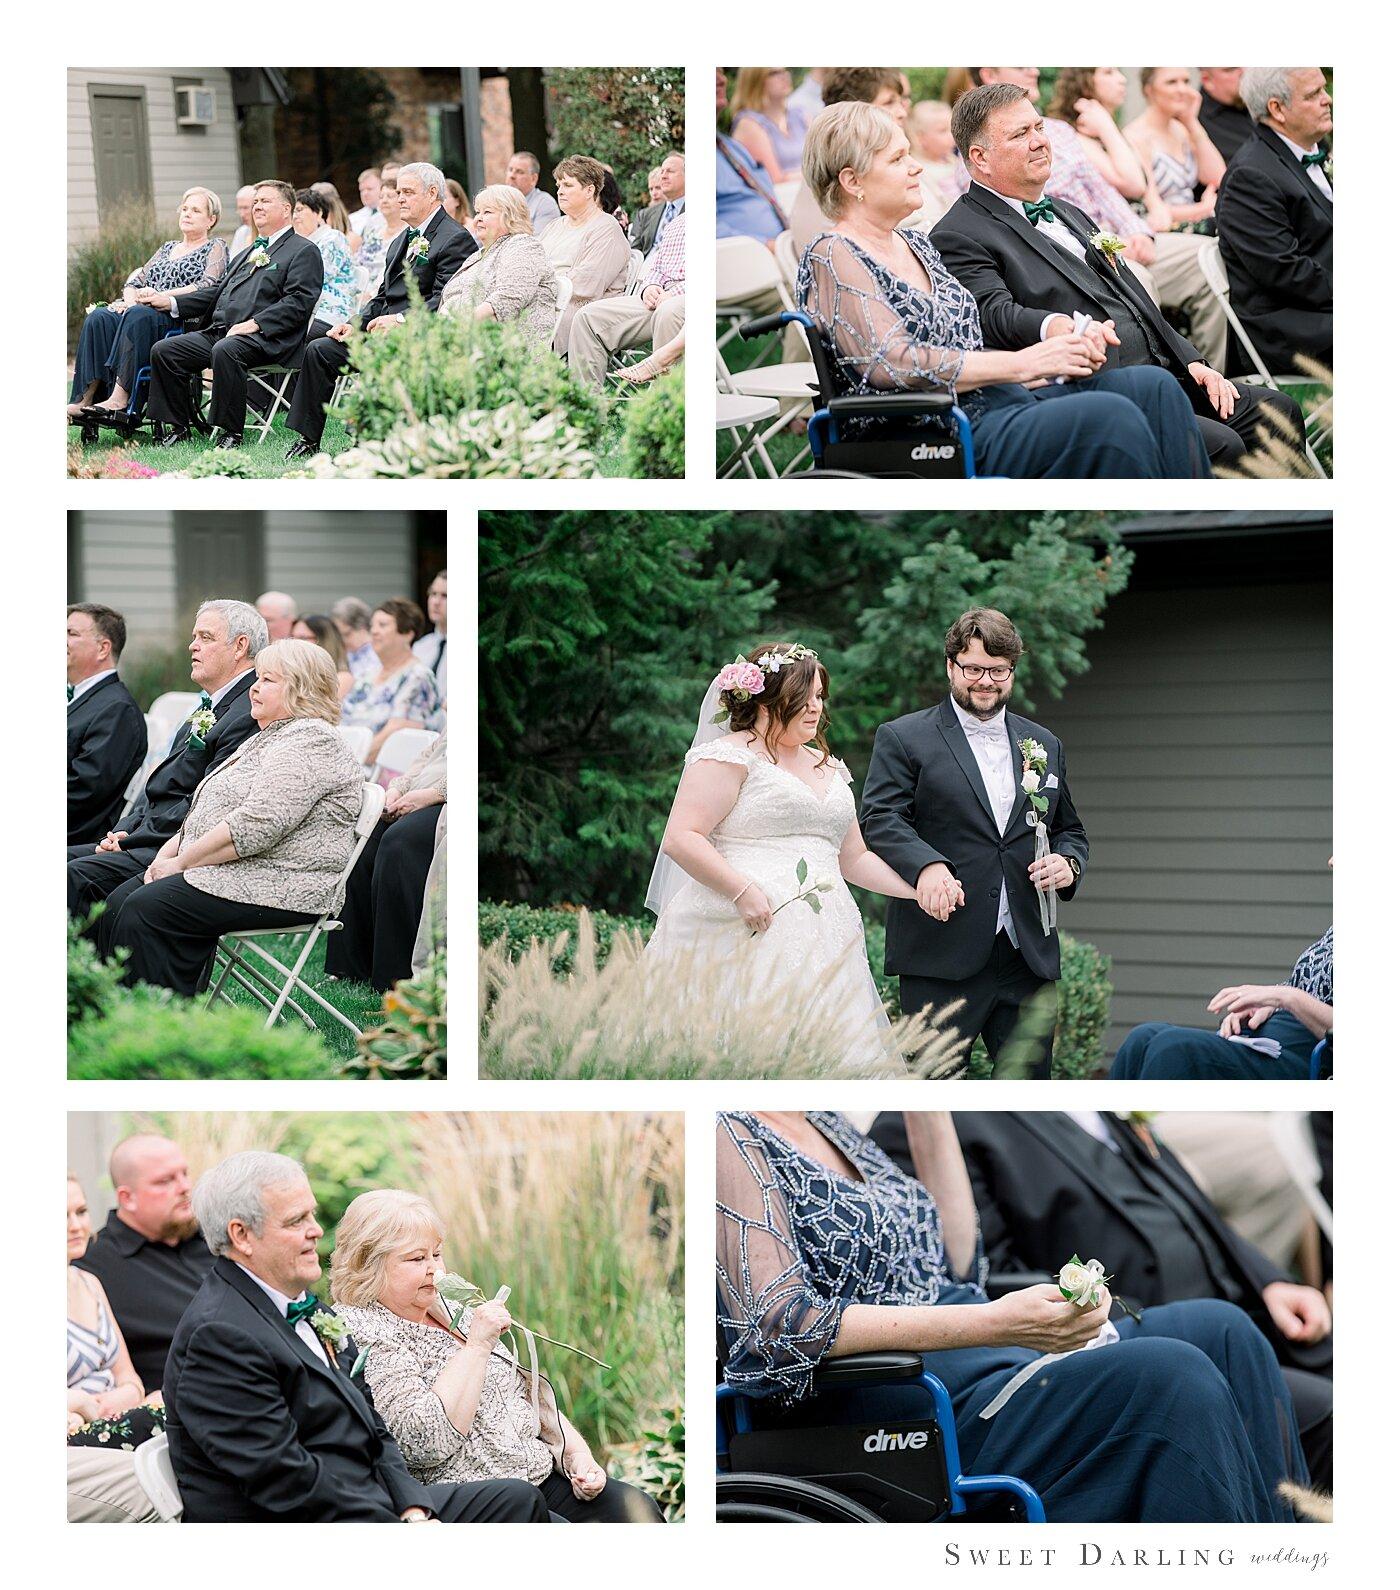 Bloomington-Normal-IL-Wedding-Photographer-eastland-suites-hotel_0021.jpg